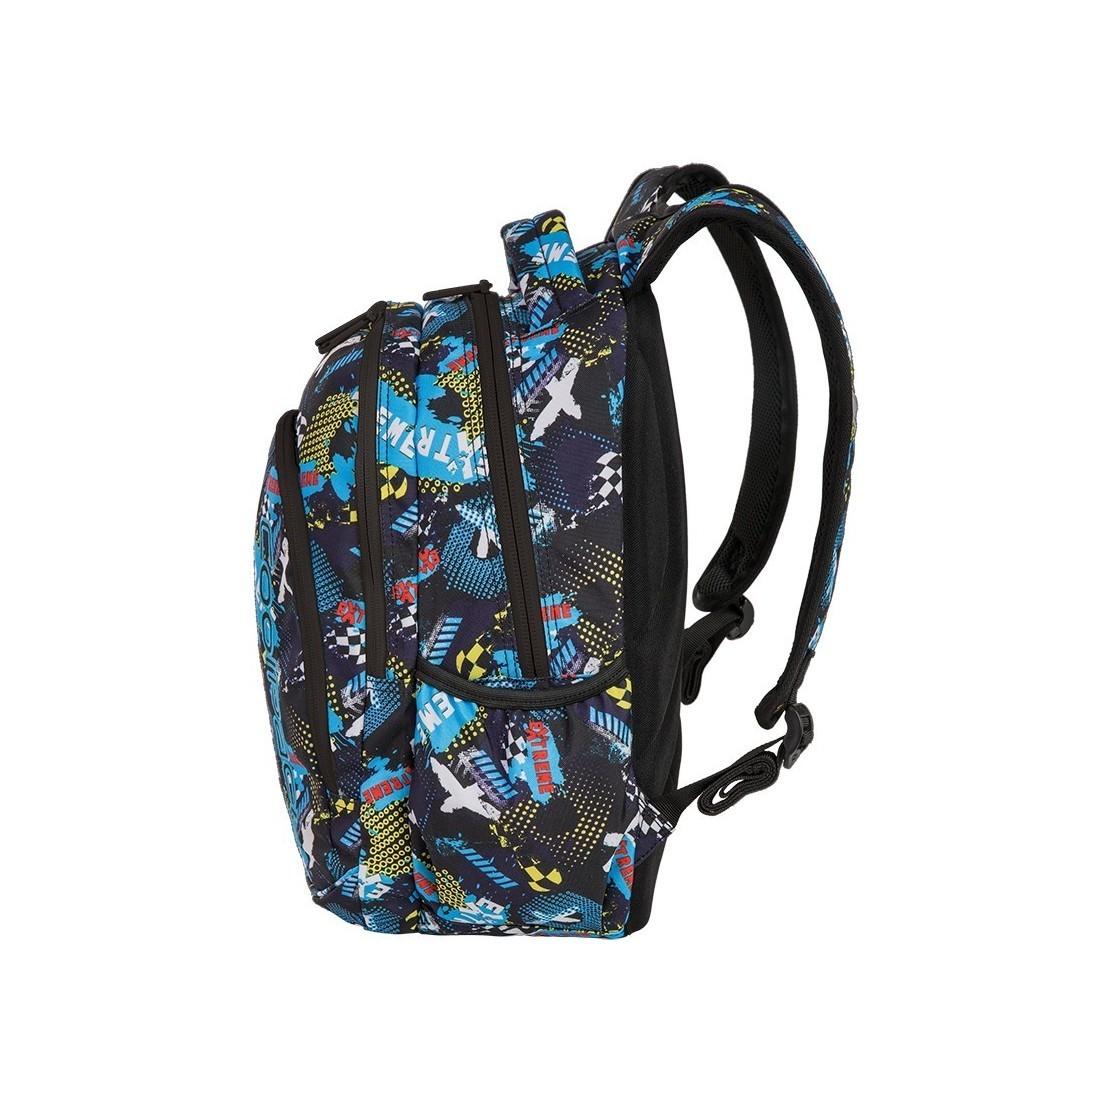 3dae951e08f53 ... Plecak do szkoły (klasy 1-3) CoolPack CP PRIME EXTREME dla chłopca - ·  GRATIS COOLER BAG